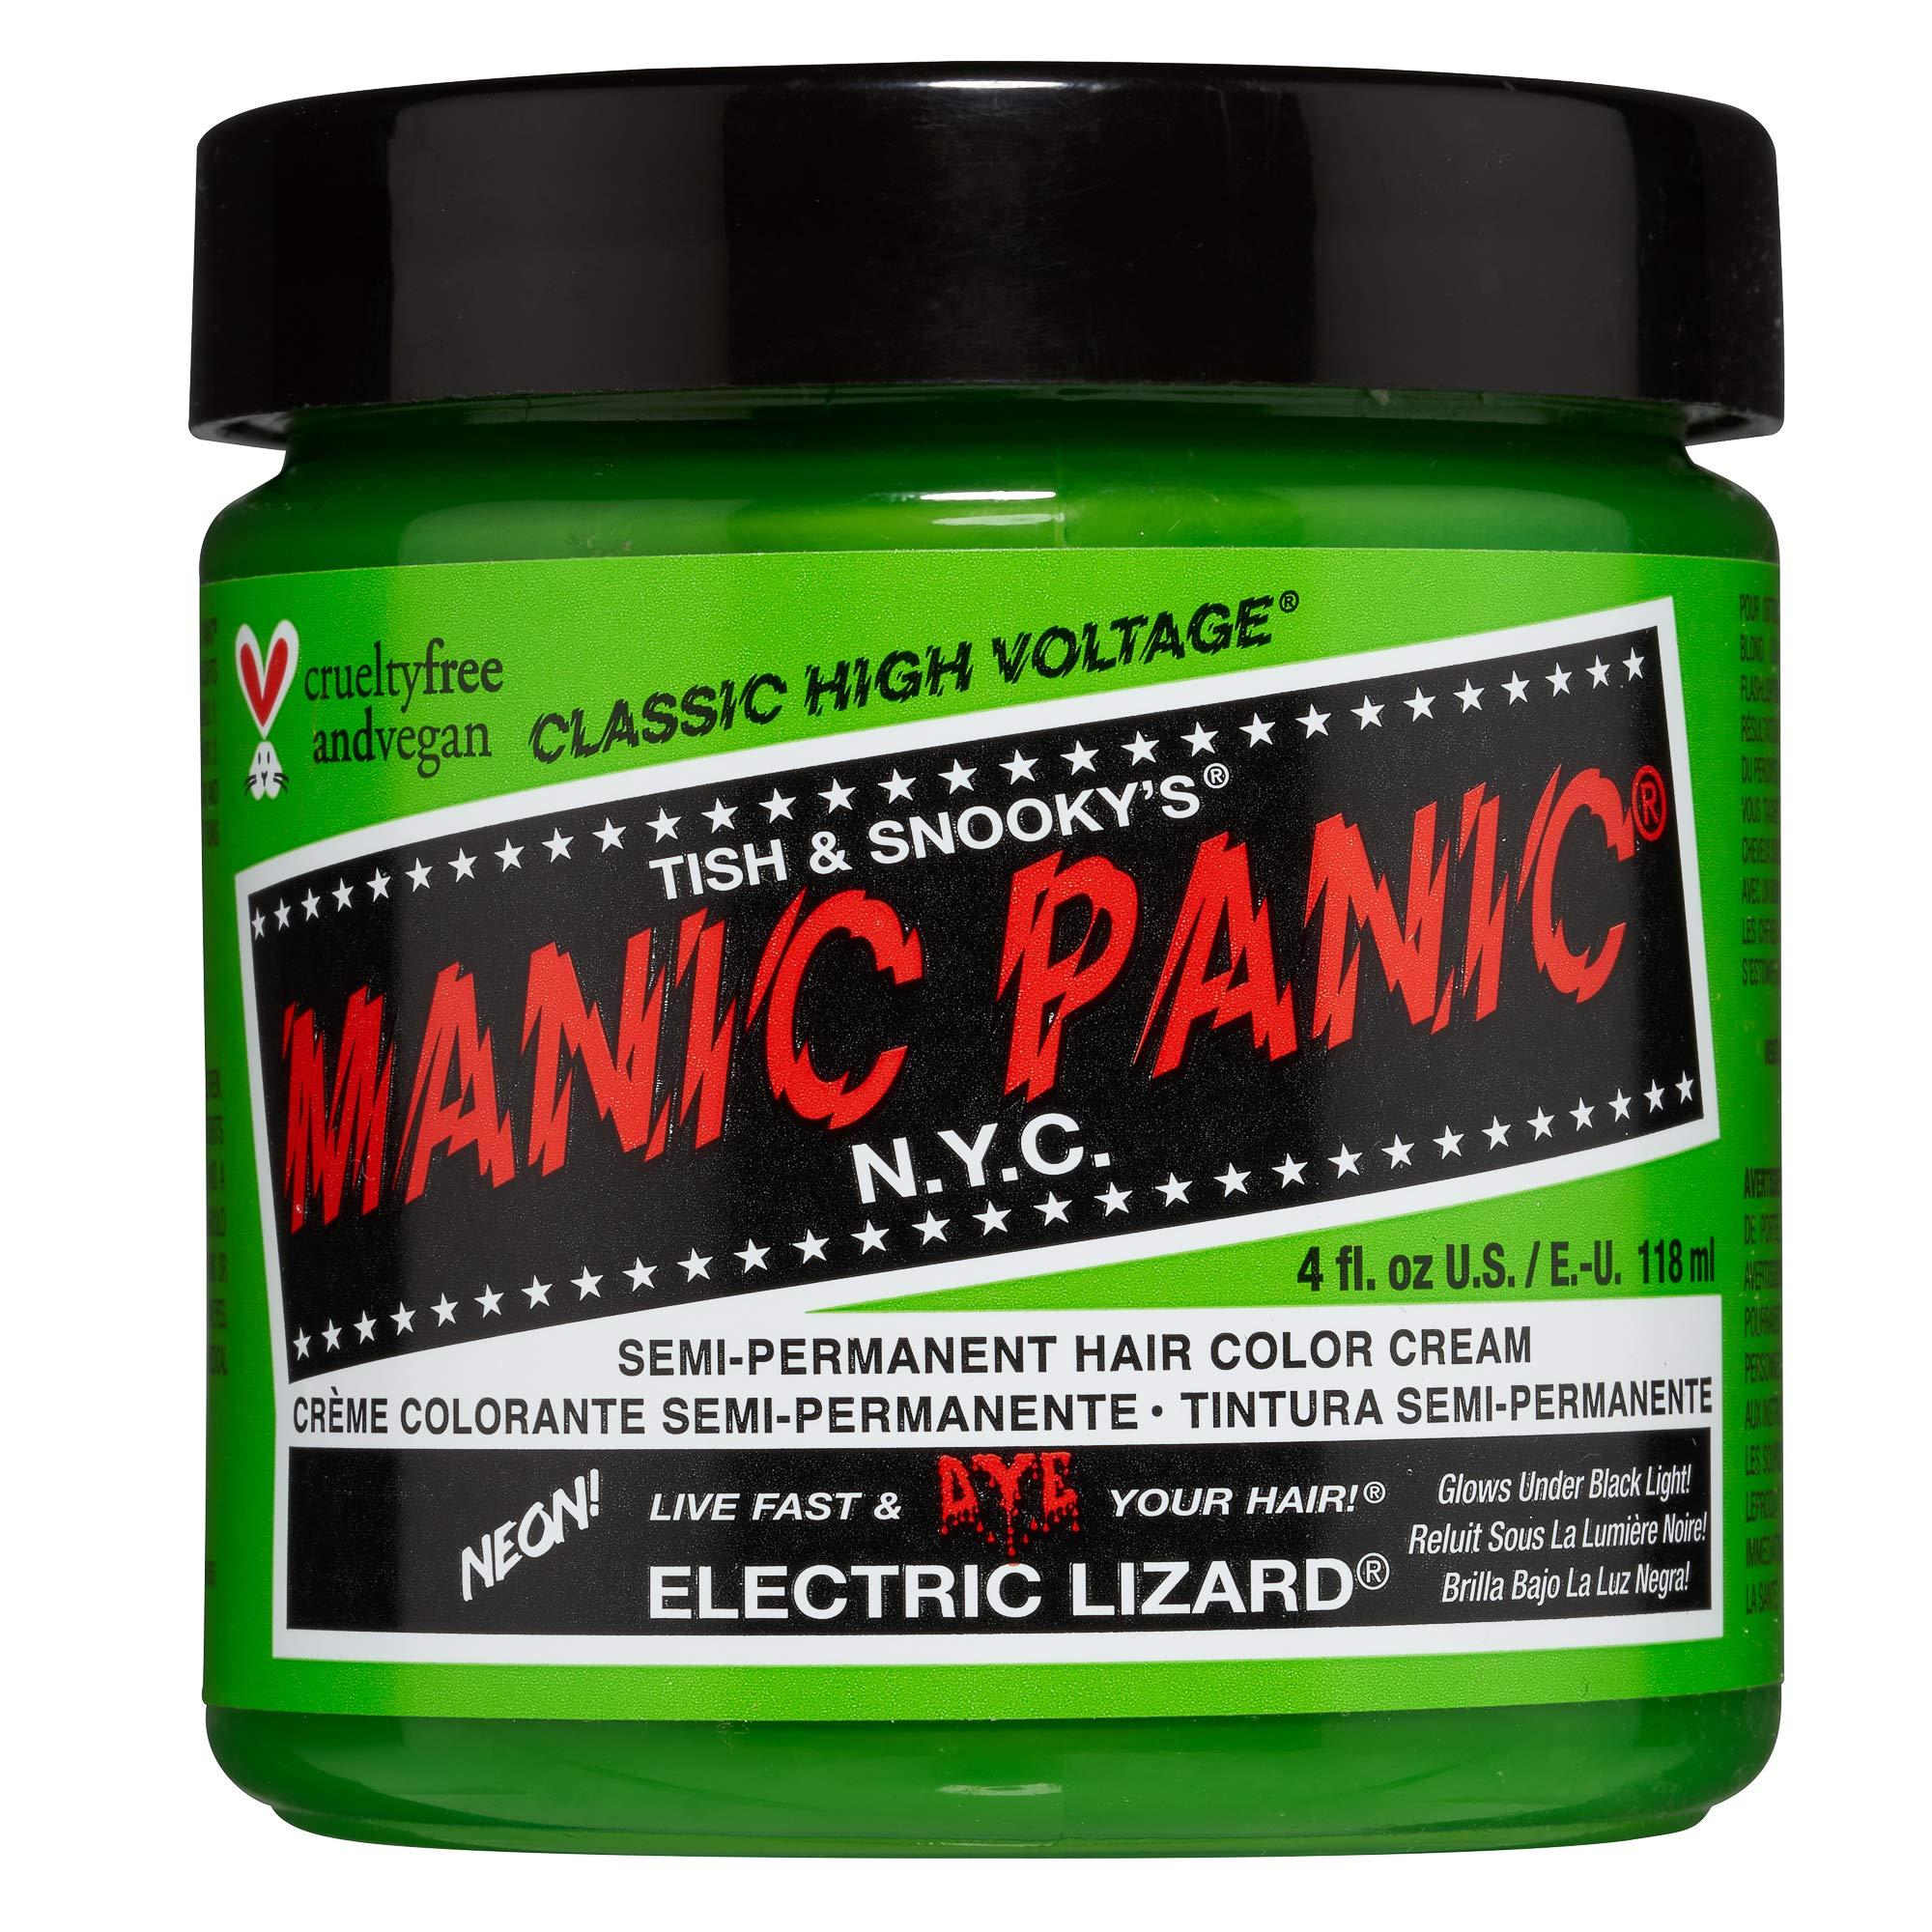 Manic Panic Hair Dye (4oz, Electric Lizard)